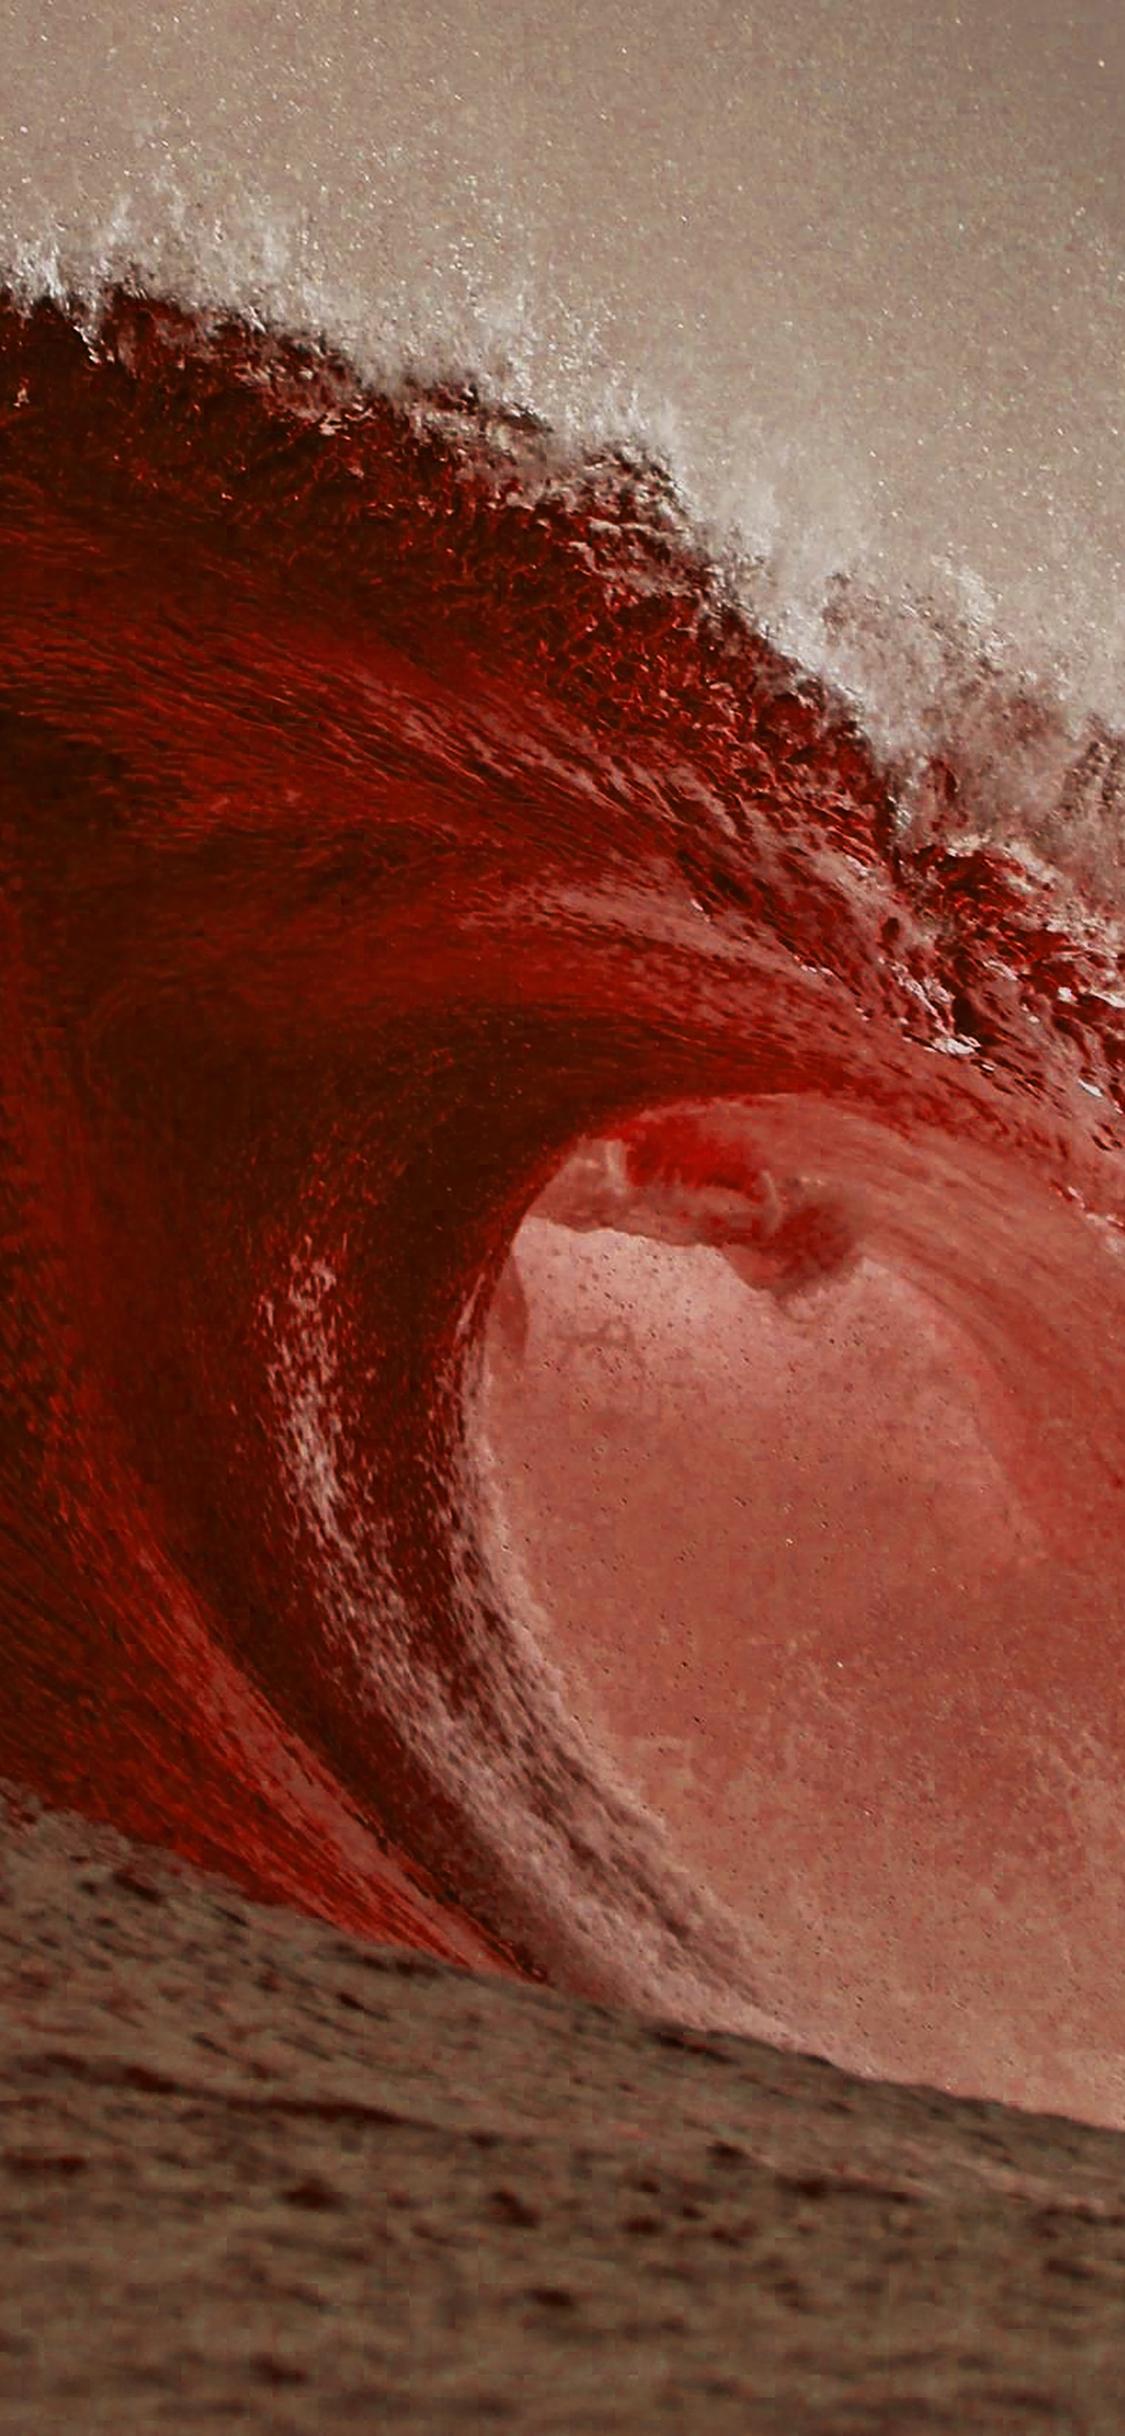 iPhoneXpapers.com-Apple-iPhone-wallpaper-mj36-sea-blood-ocean-wave-nature